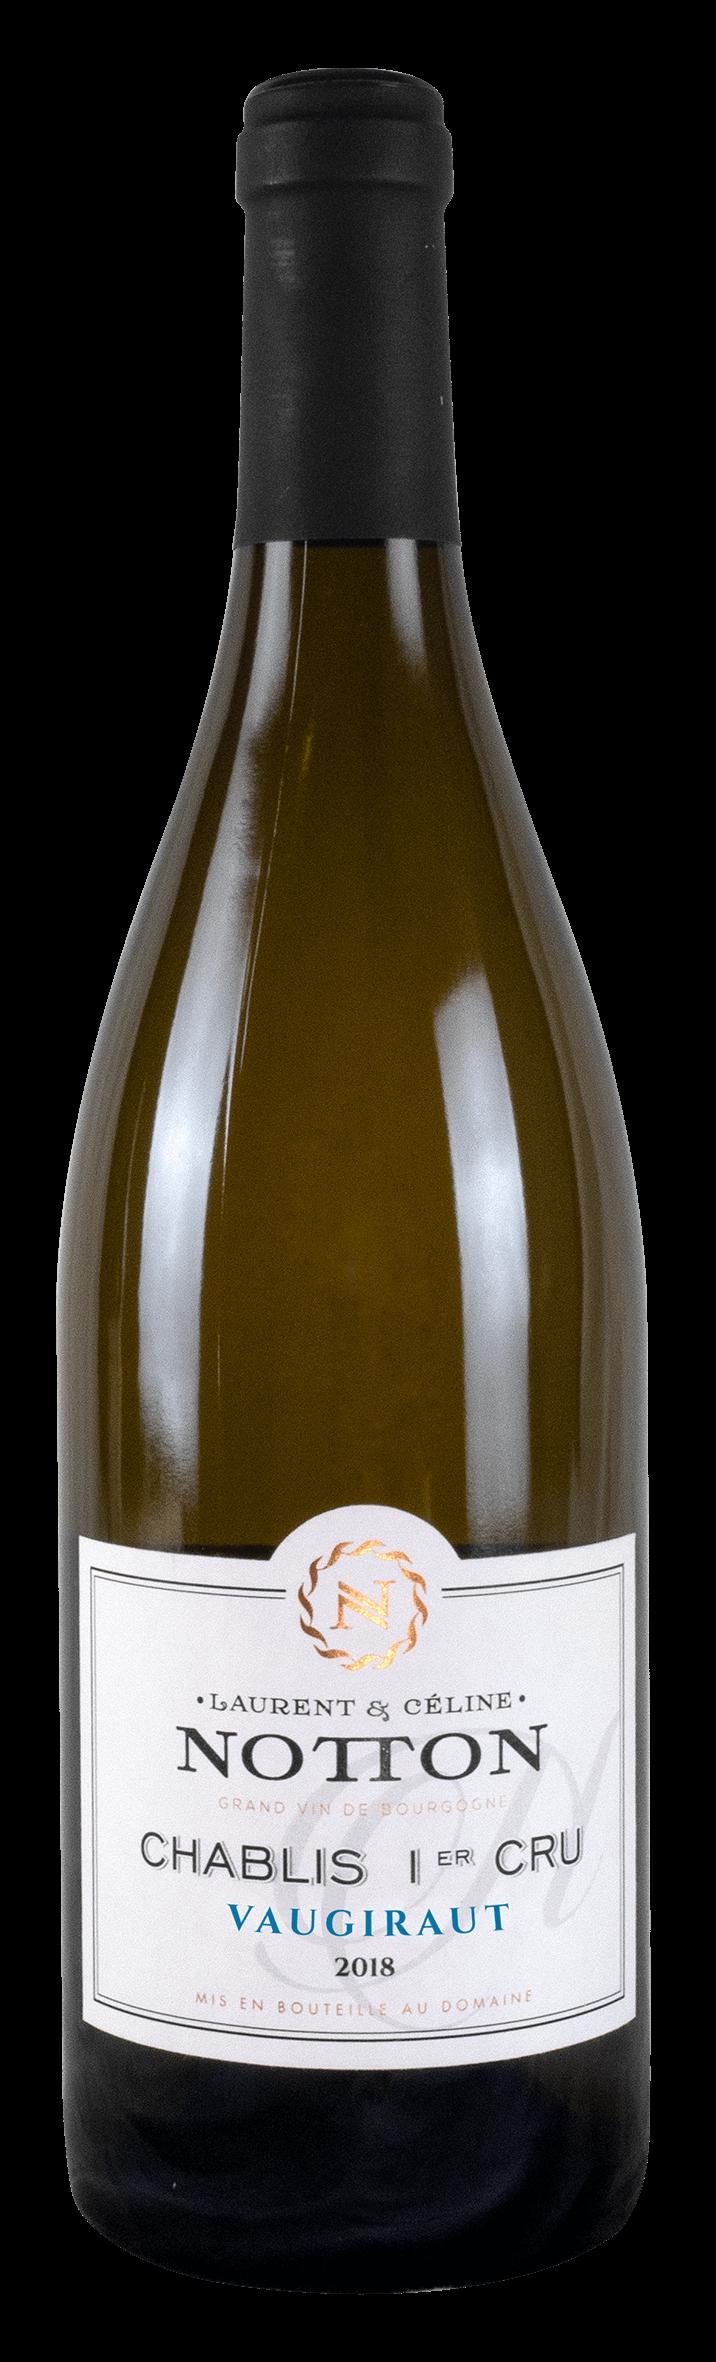 bouteille NOTTON Chablis 1er Cru VAUGIRAUT 2018